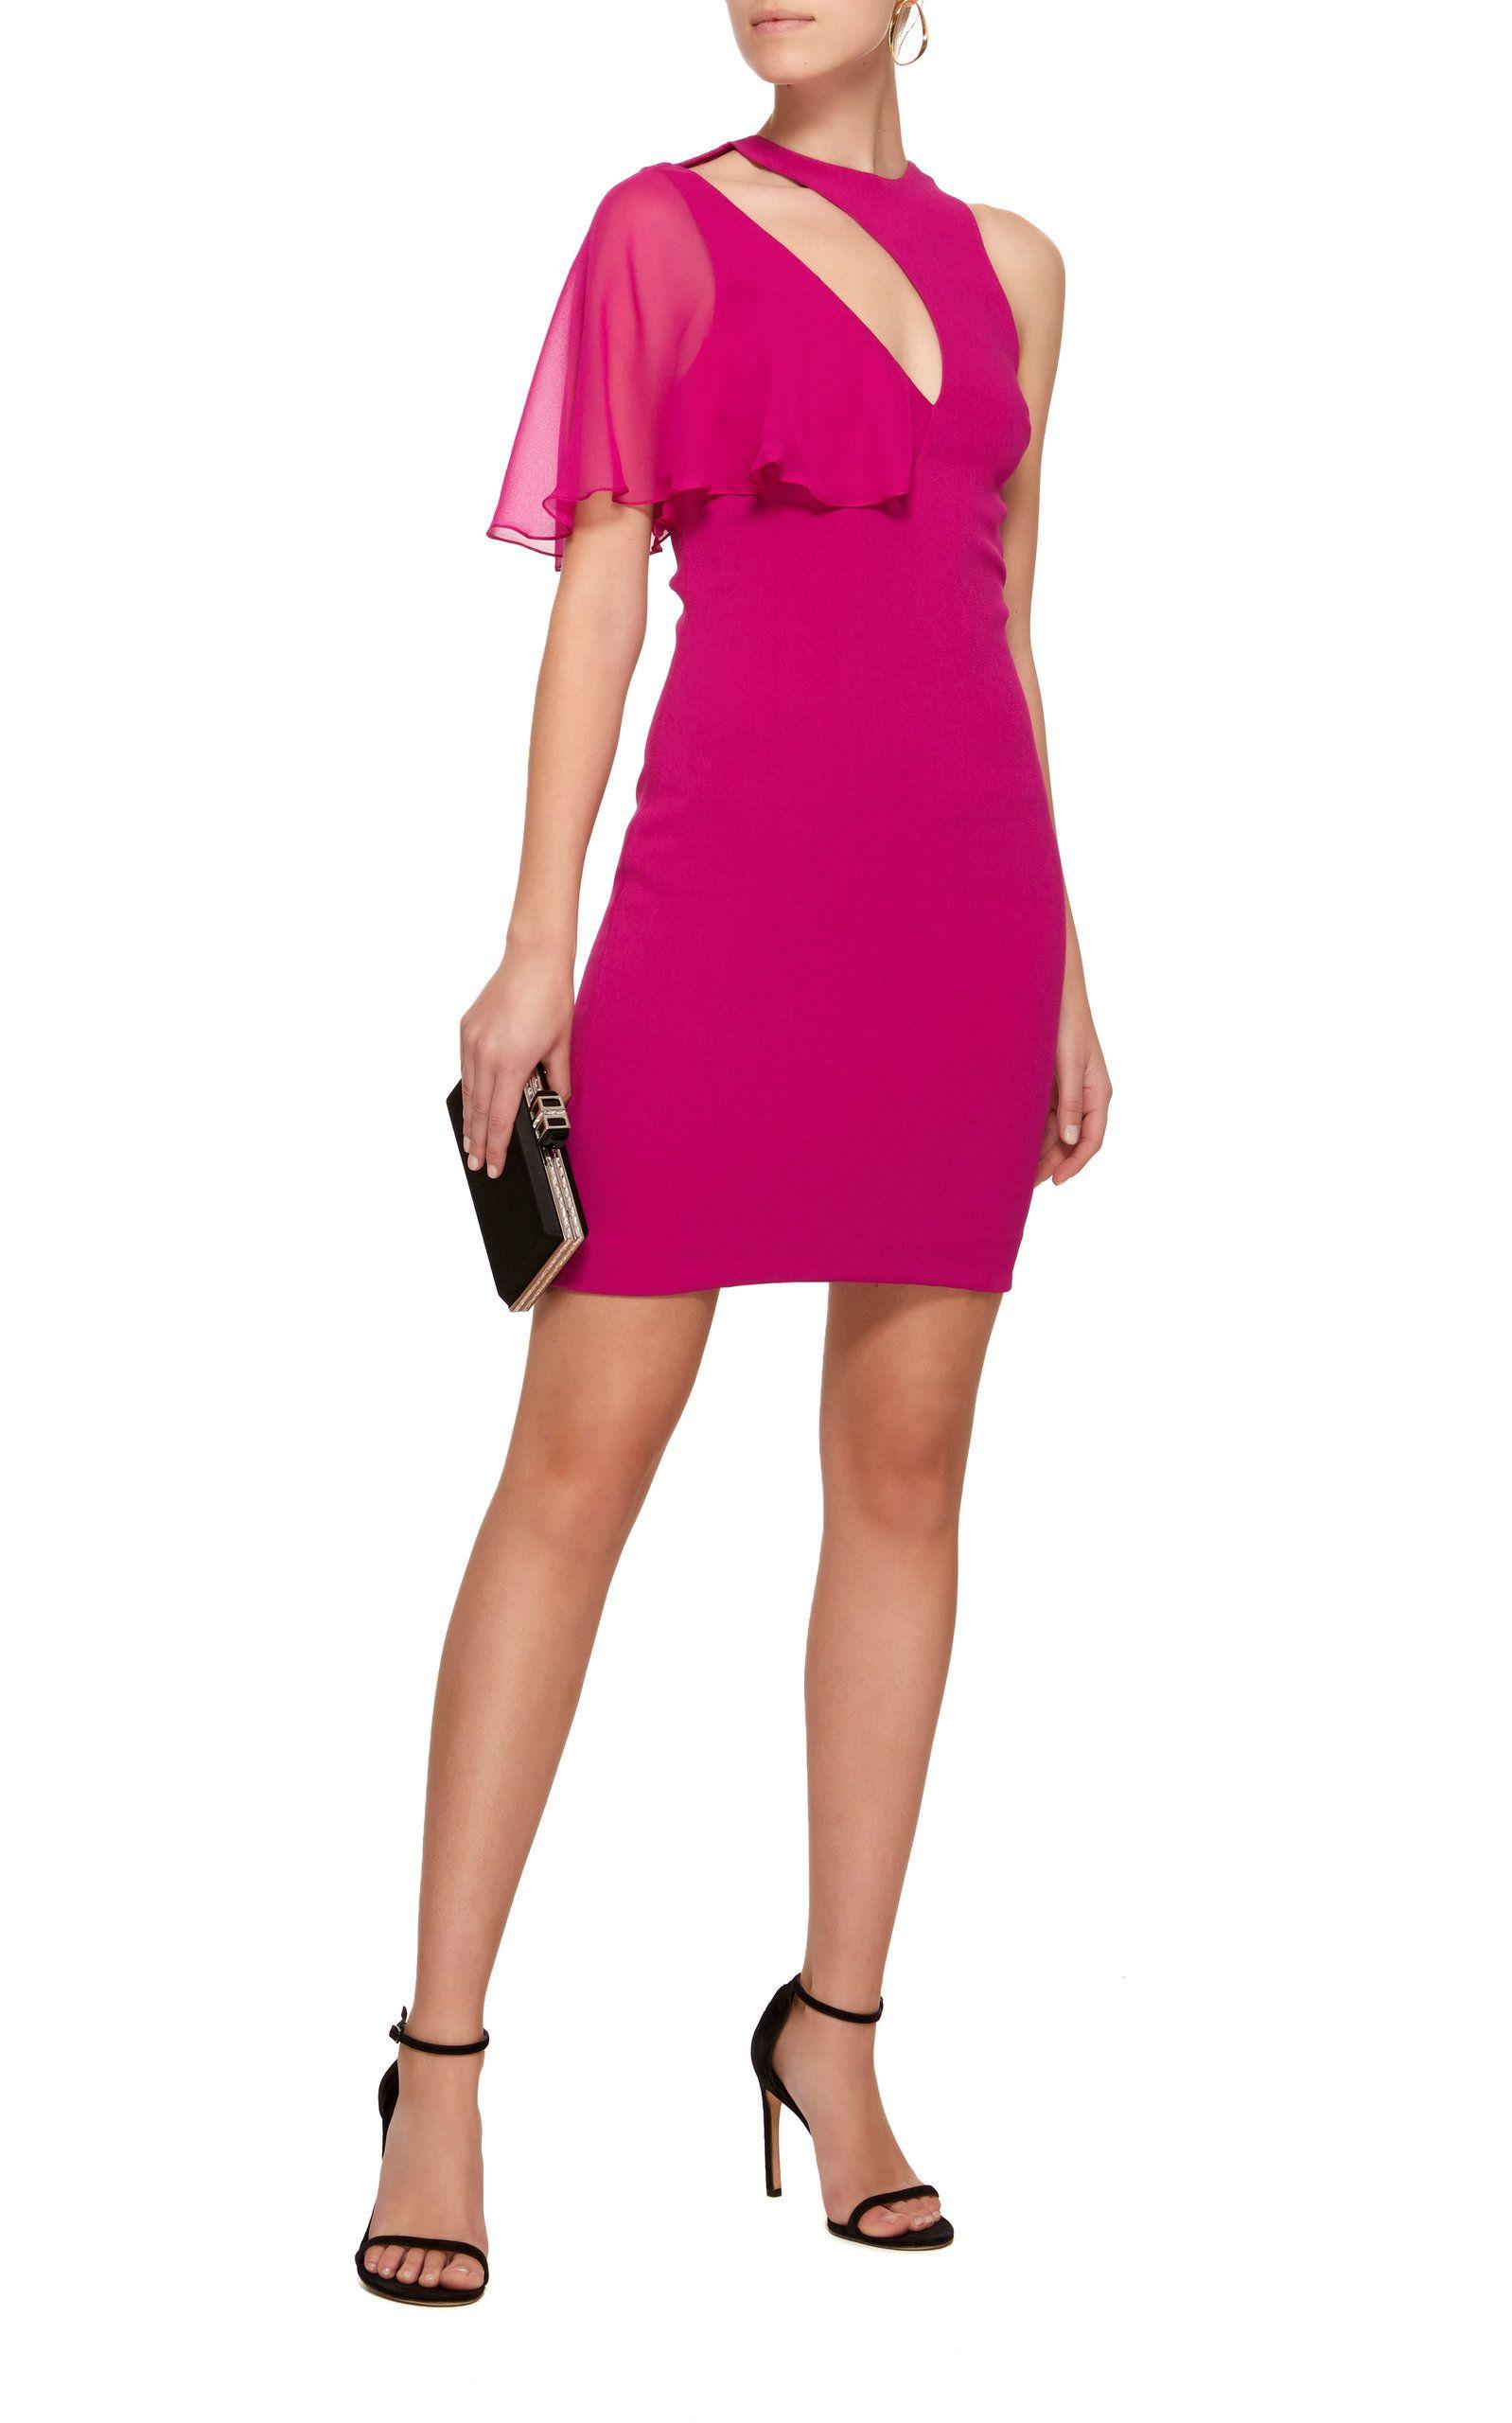 Cushnie et Ochs Womens Mini Dress with Cutout